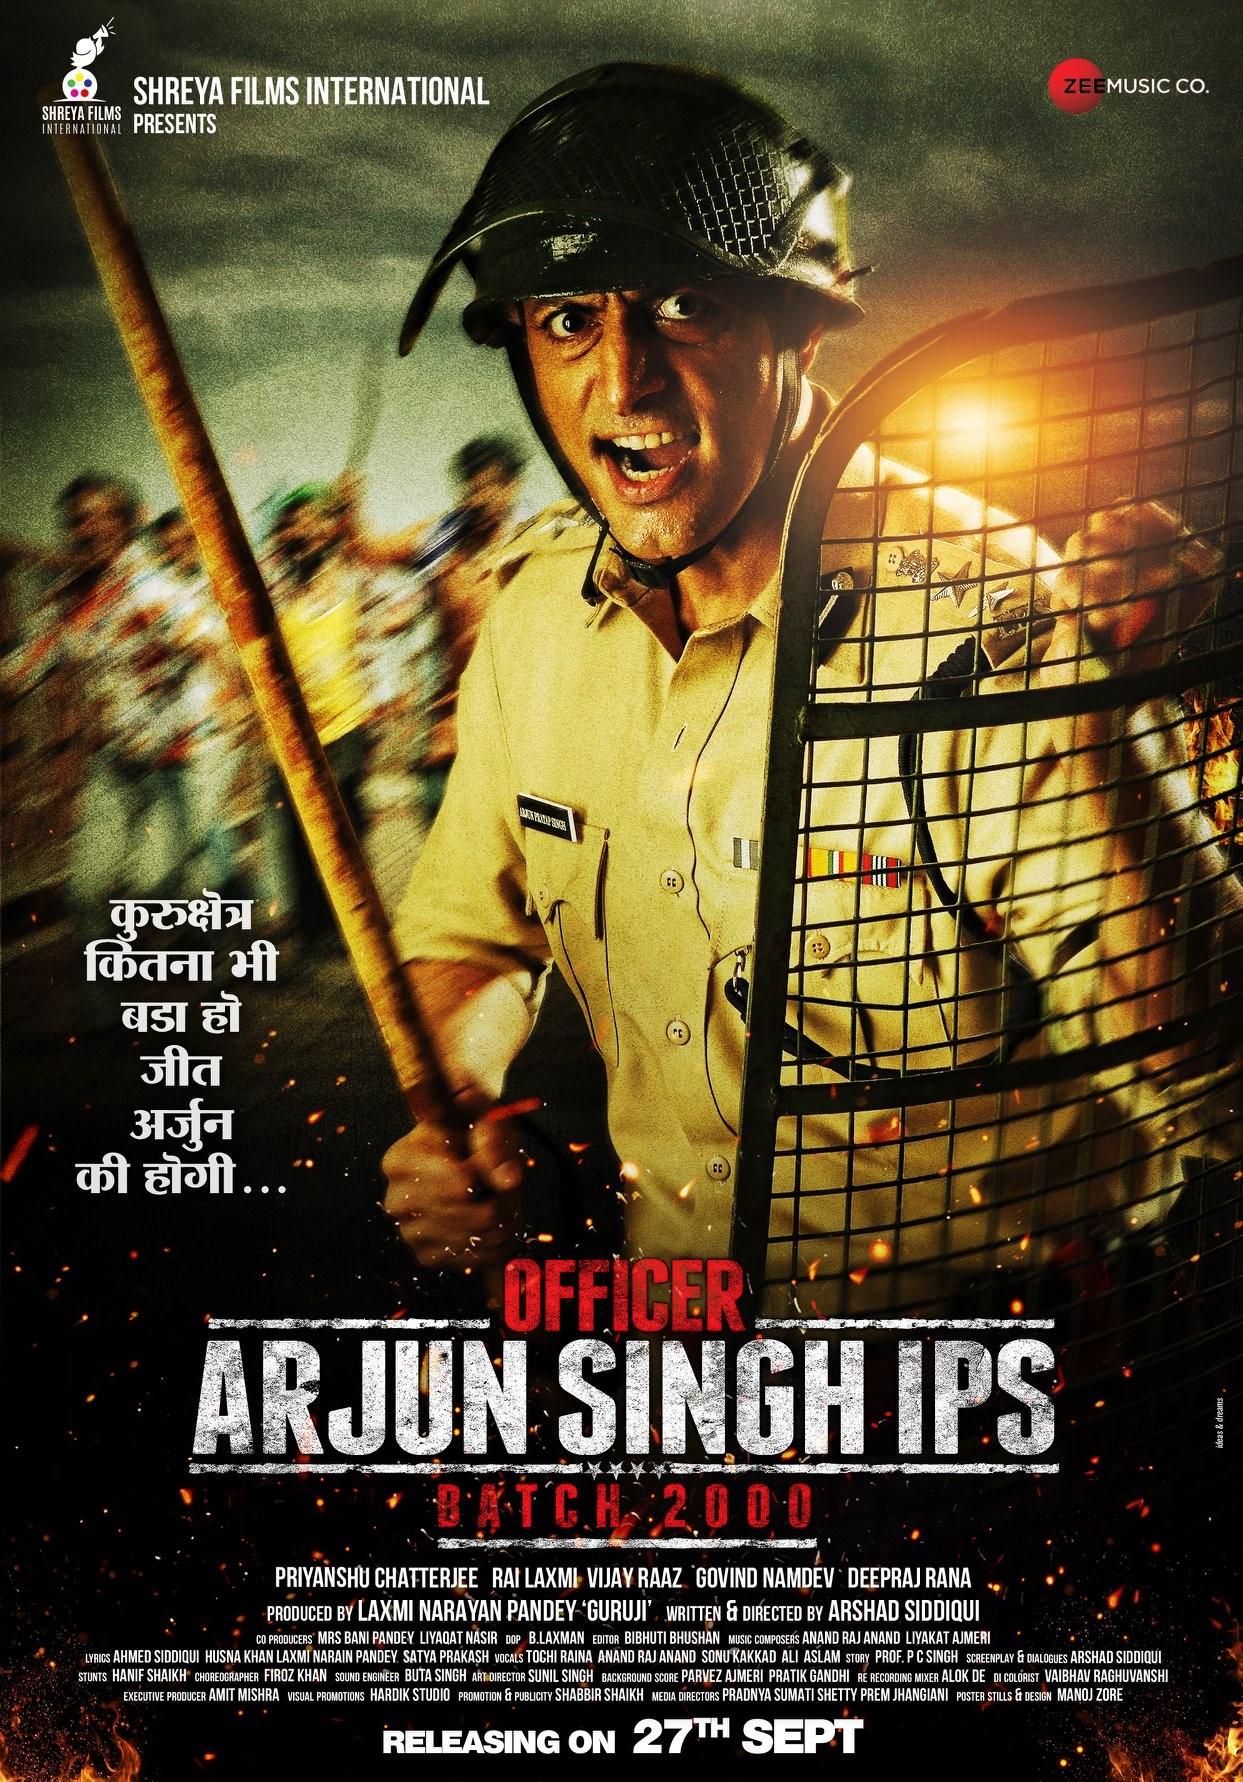 Officer Arjun Singh IPS (2019) - IMDb